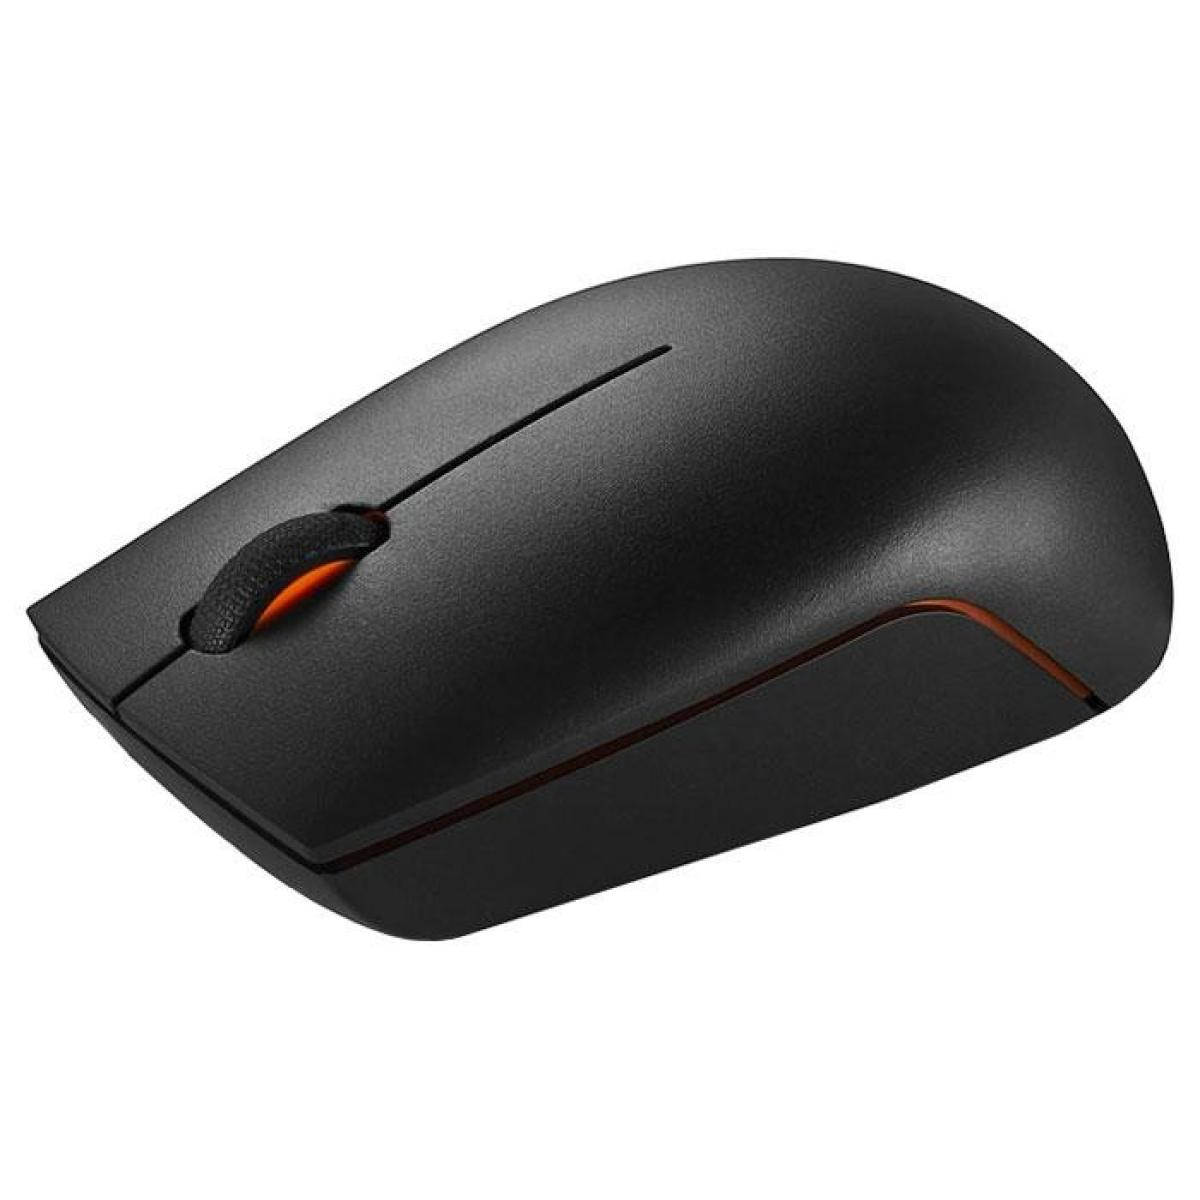 Фото  Мышь Lenovo 300 Wireless Compact Mouse (GX30K79401)